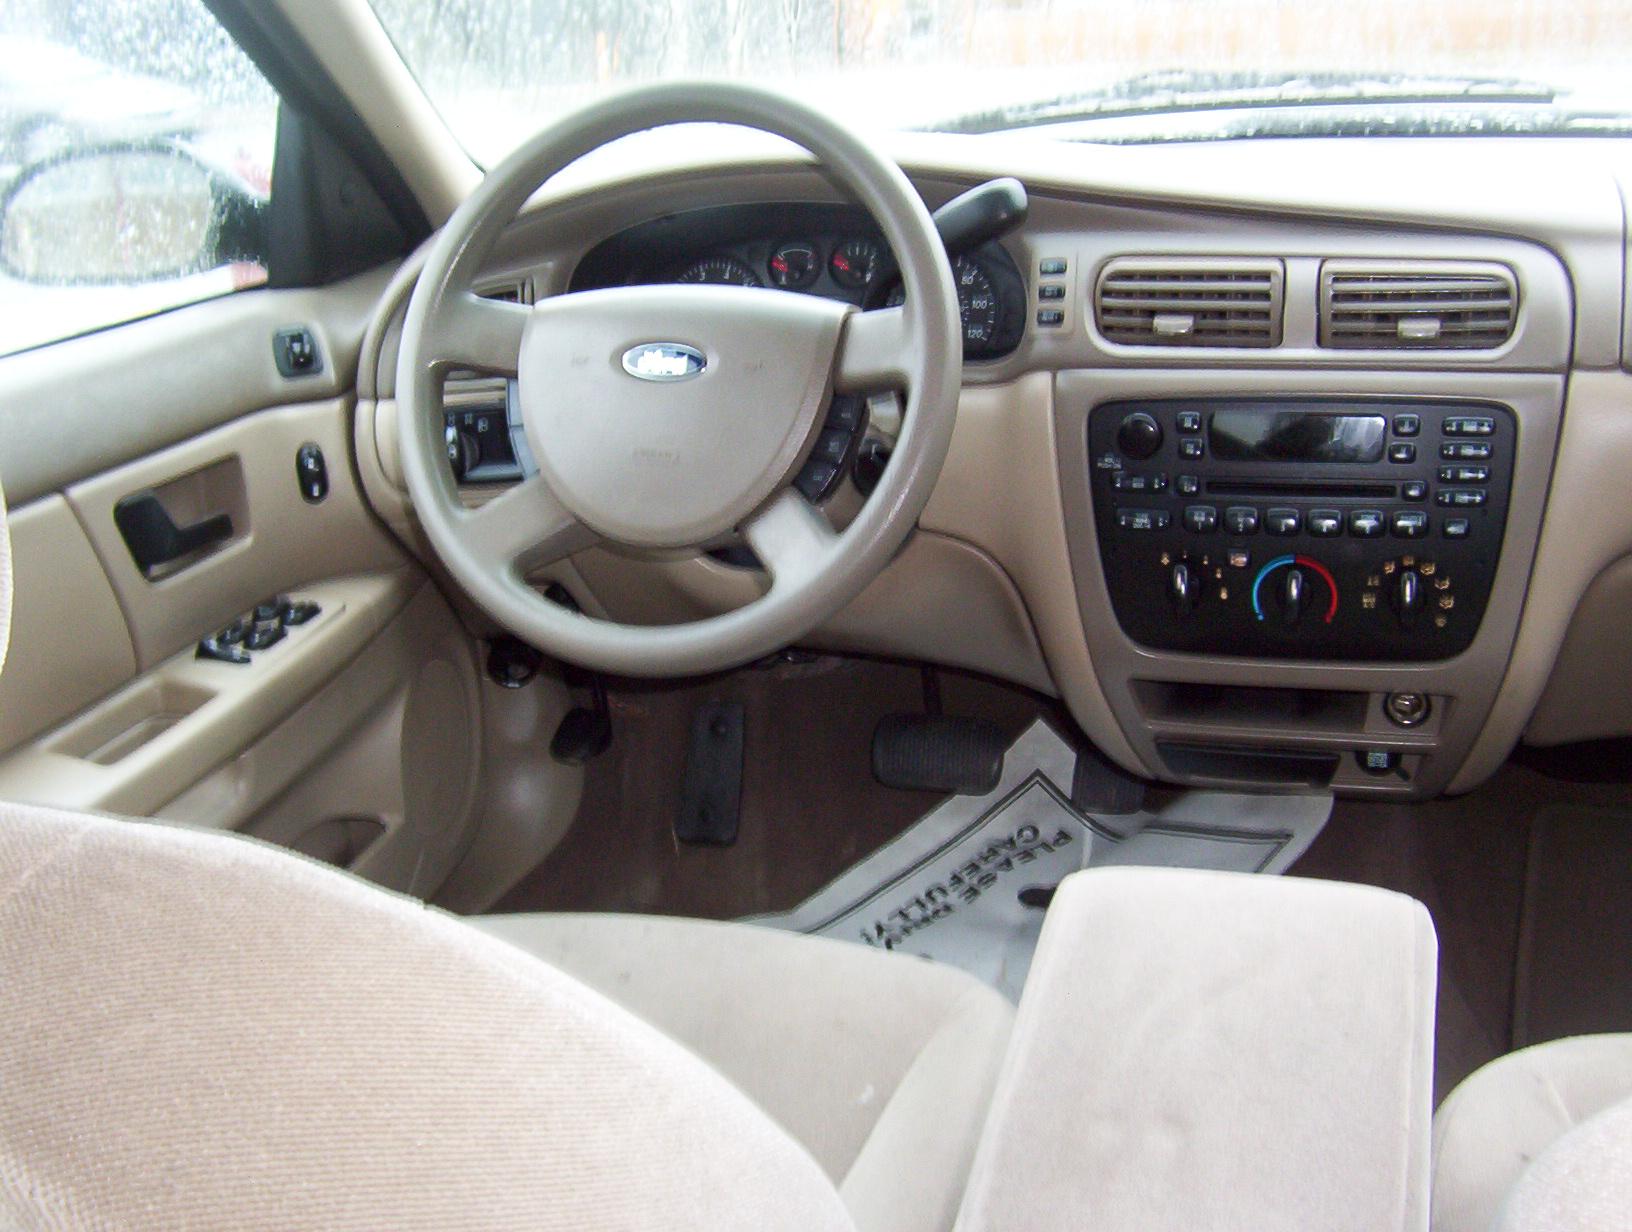 2005 Ford Taurus Image 10